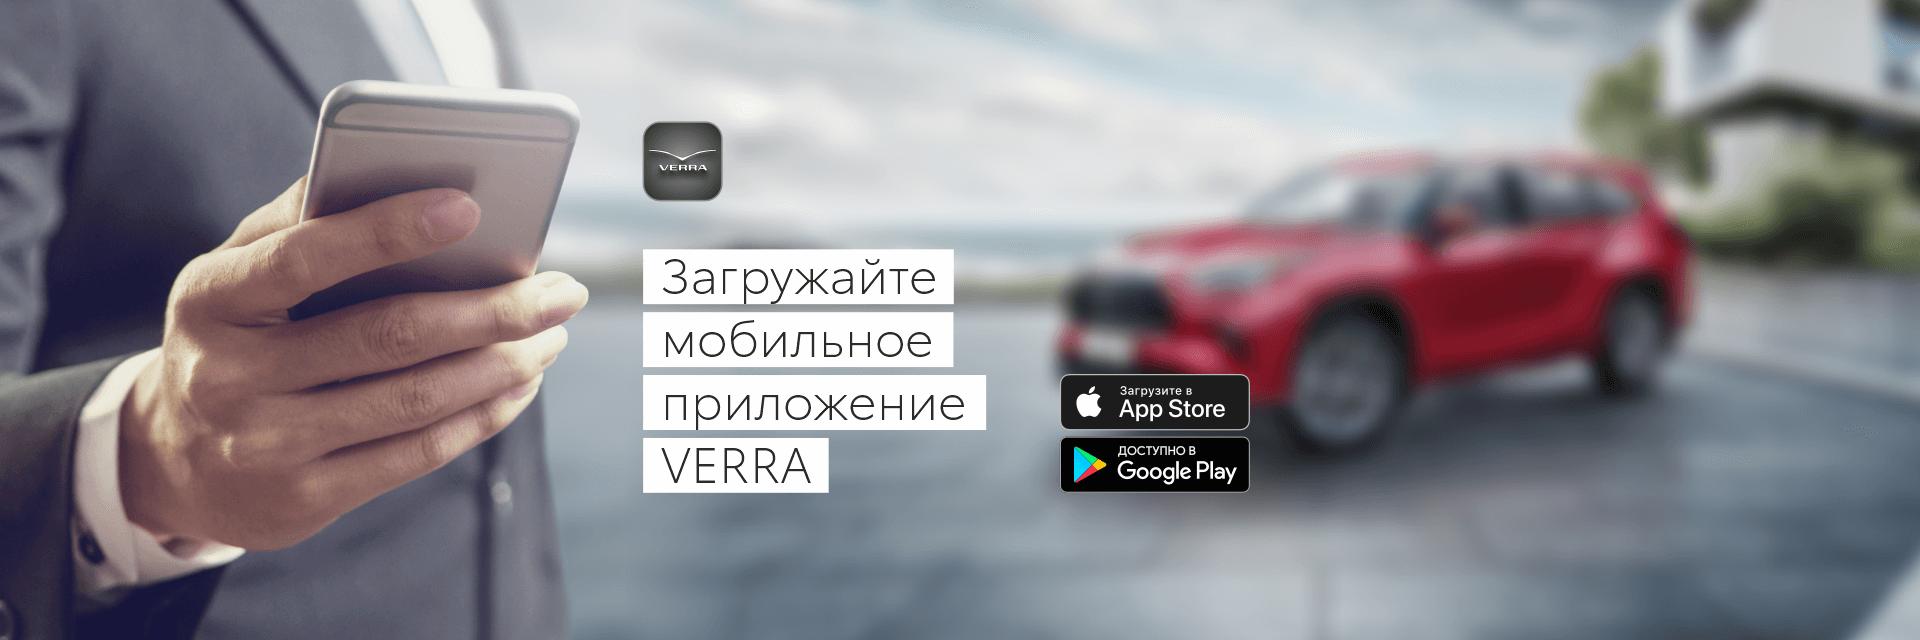 verra-app